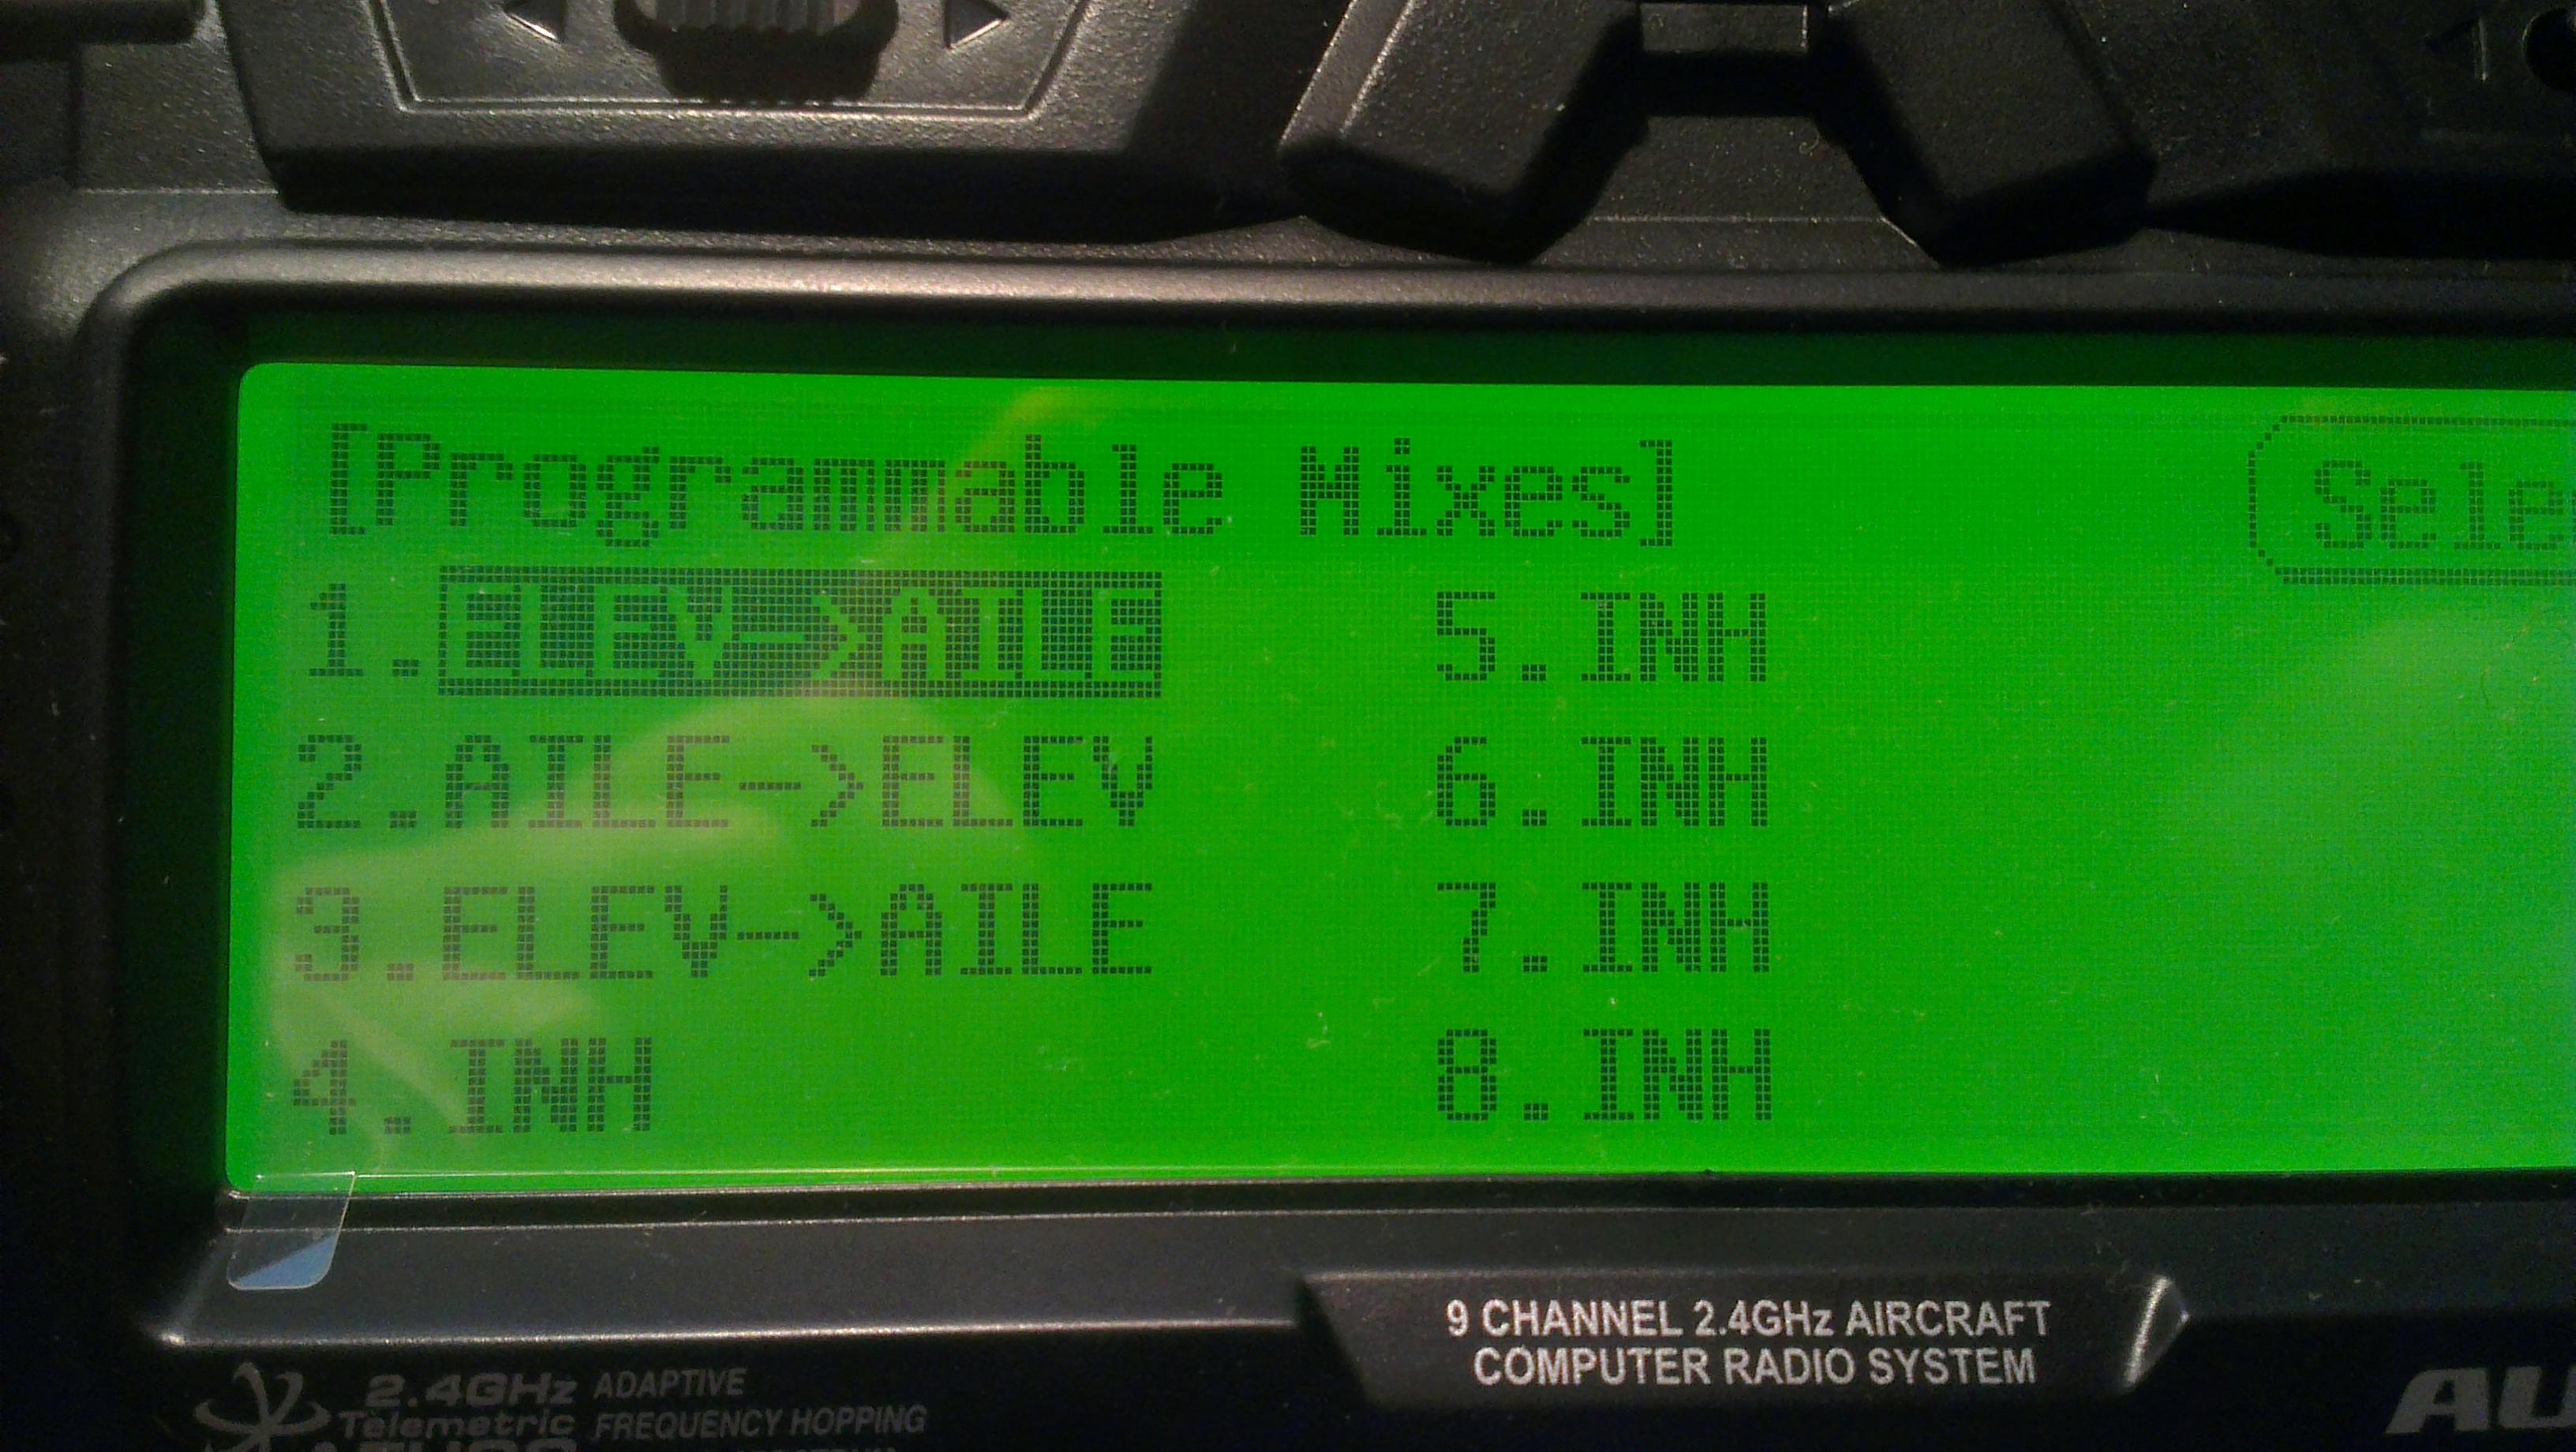 HiTEC AURORA 9 - Ustawienia radia dla katamaranu